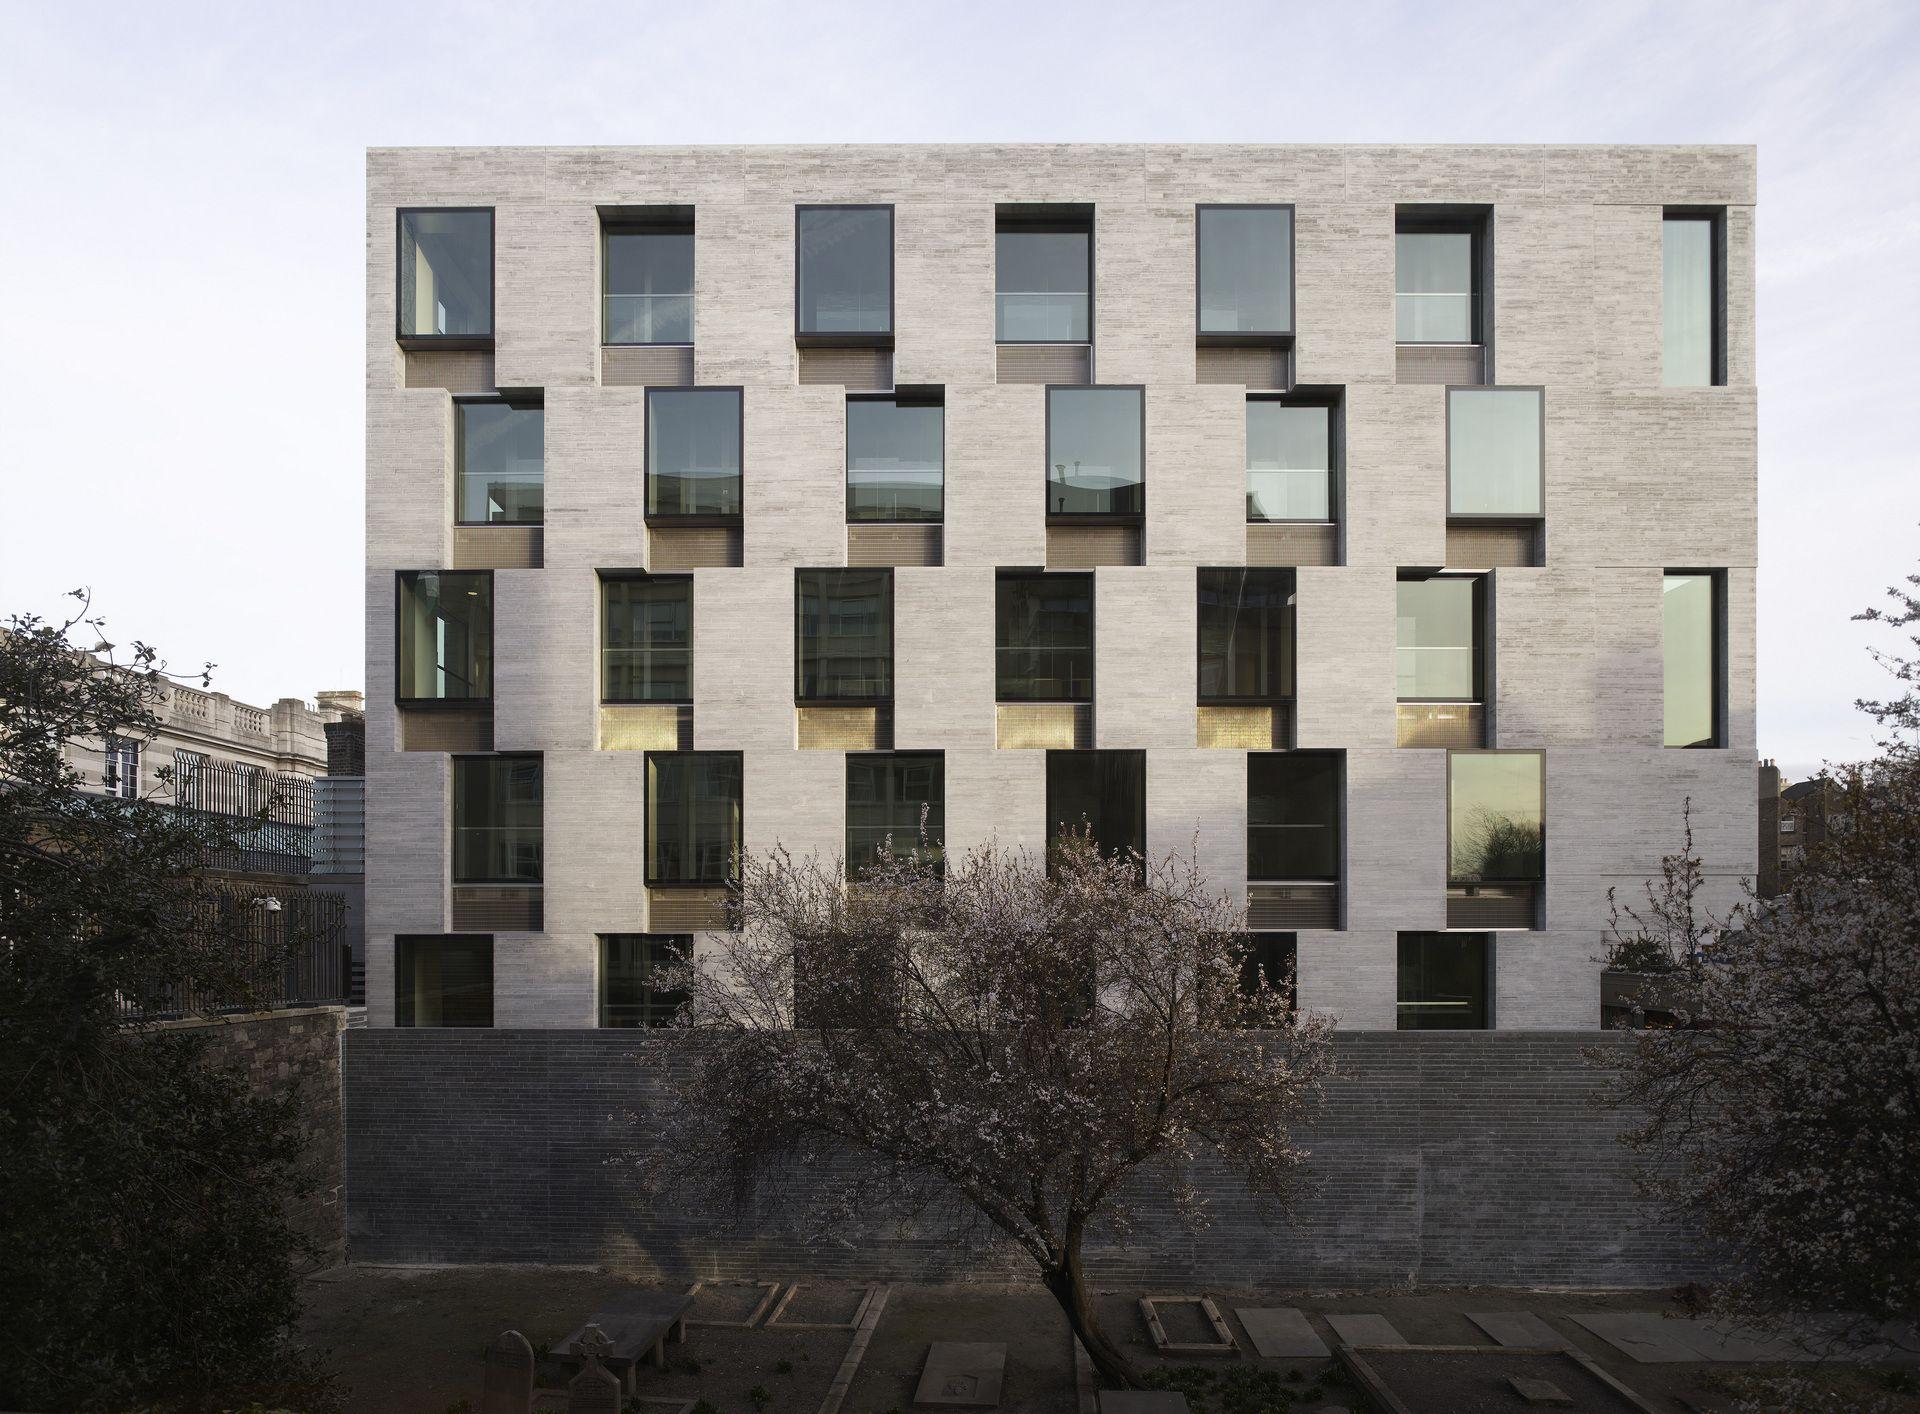 Department of finance merrion row dublin ireland for Grafton architects